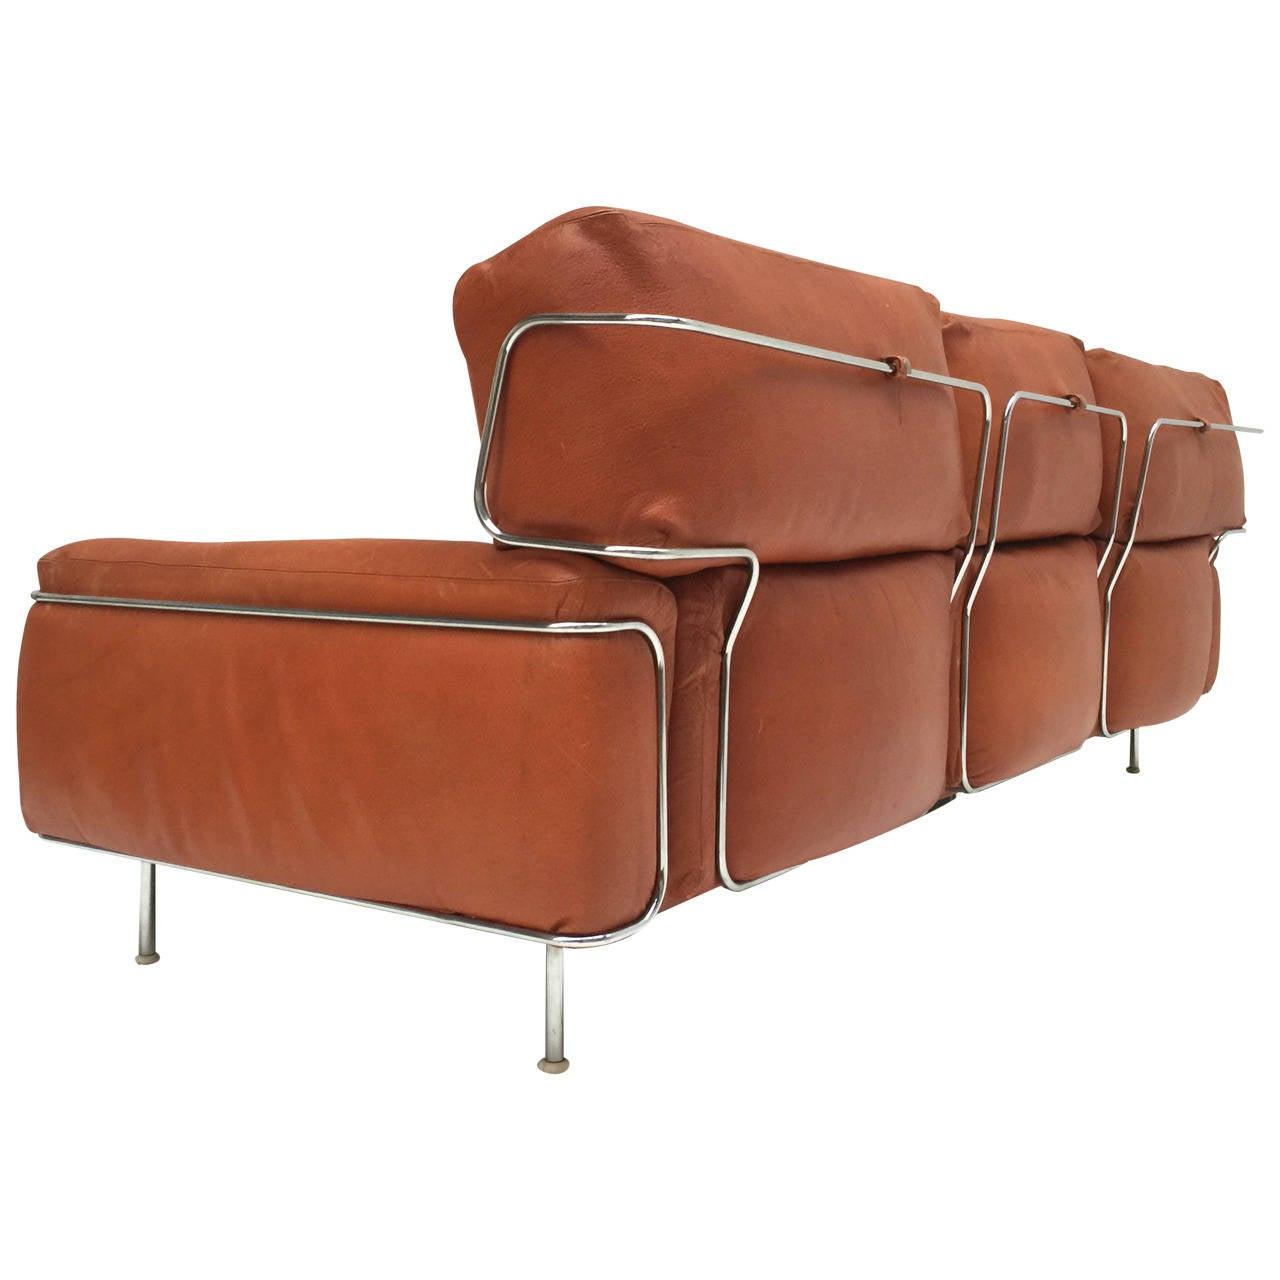 rare three seat leather sofa by vittorio introini for sapori